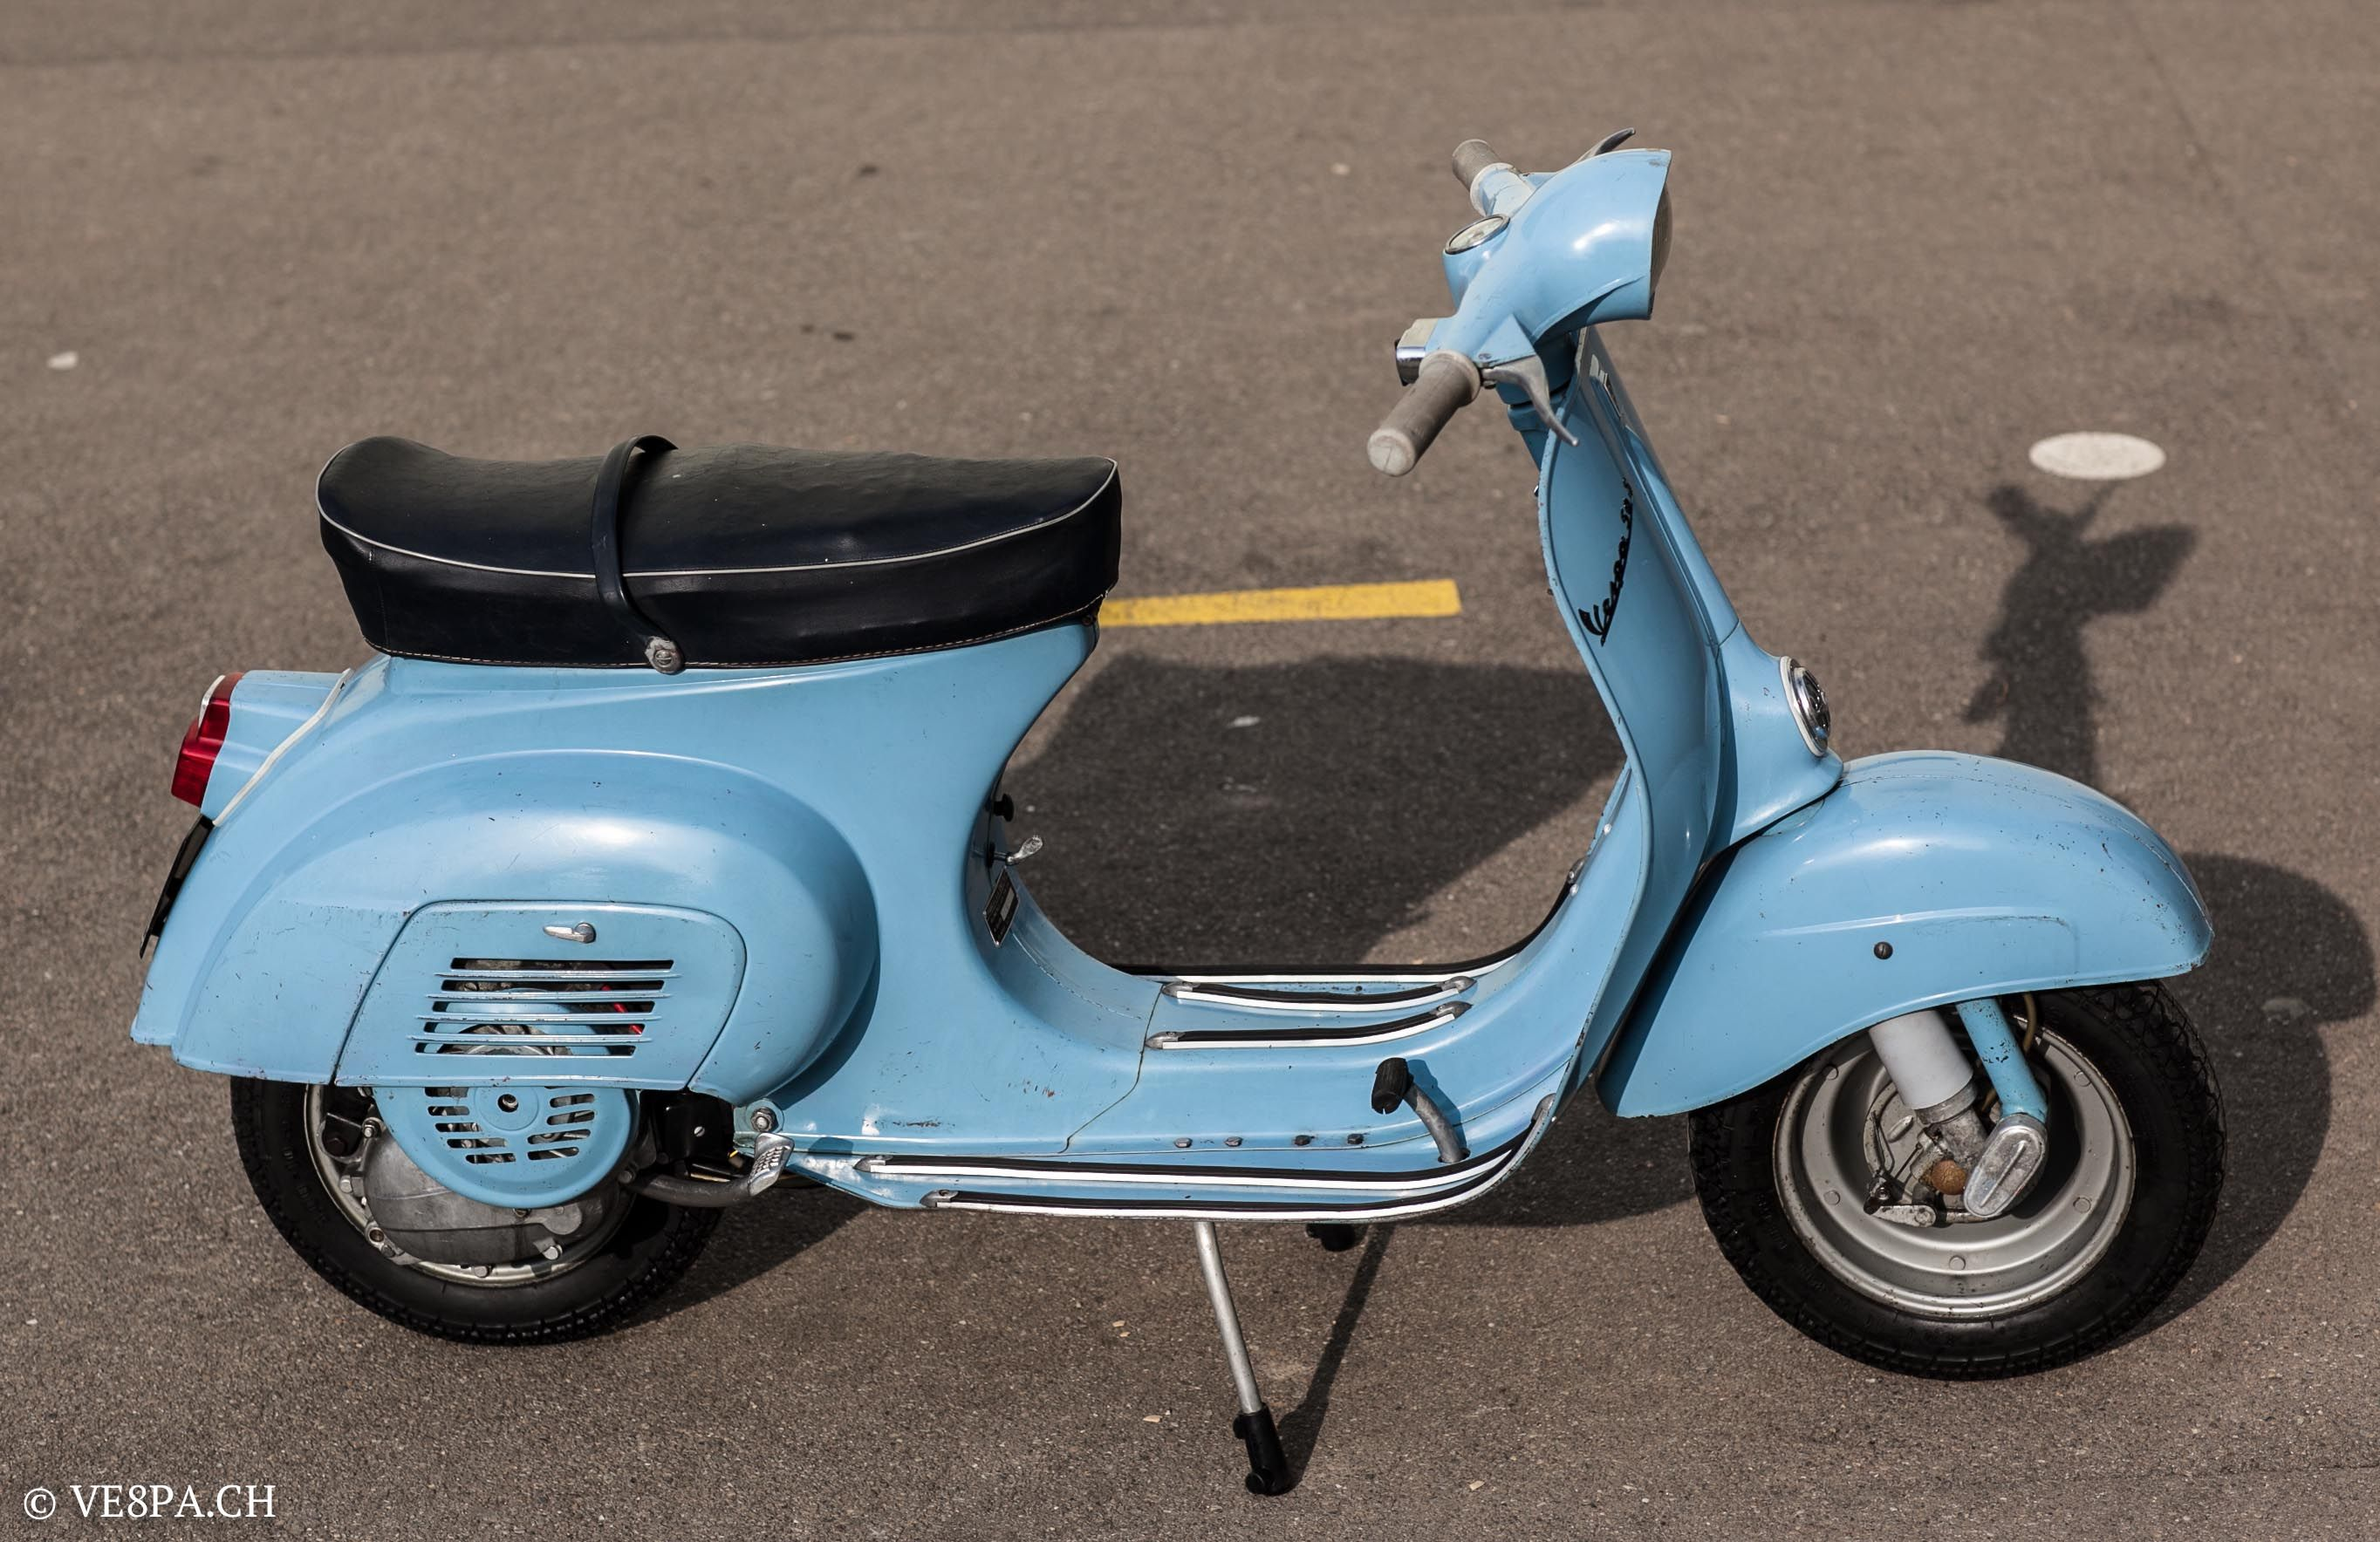 Vespa 50S, 1964, 7'000 km, im O-Lack, original condition, conservata. Over 70 more pictures here: https://ve8pa.ch/2015/02/15/vespa-50s-1964-mit-7000-km-rahmen-nr-5133/